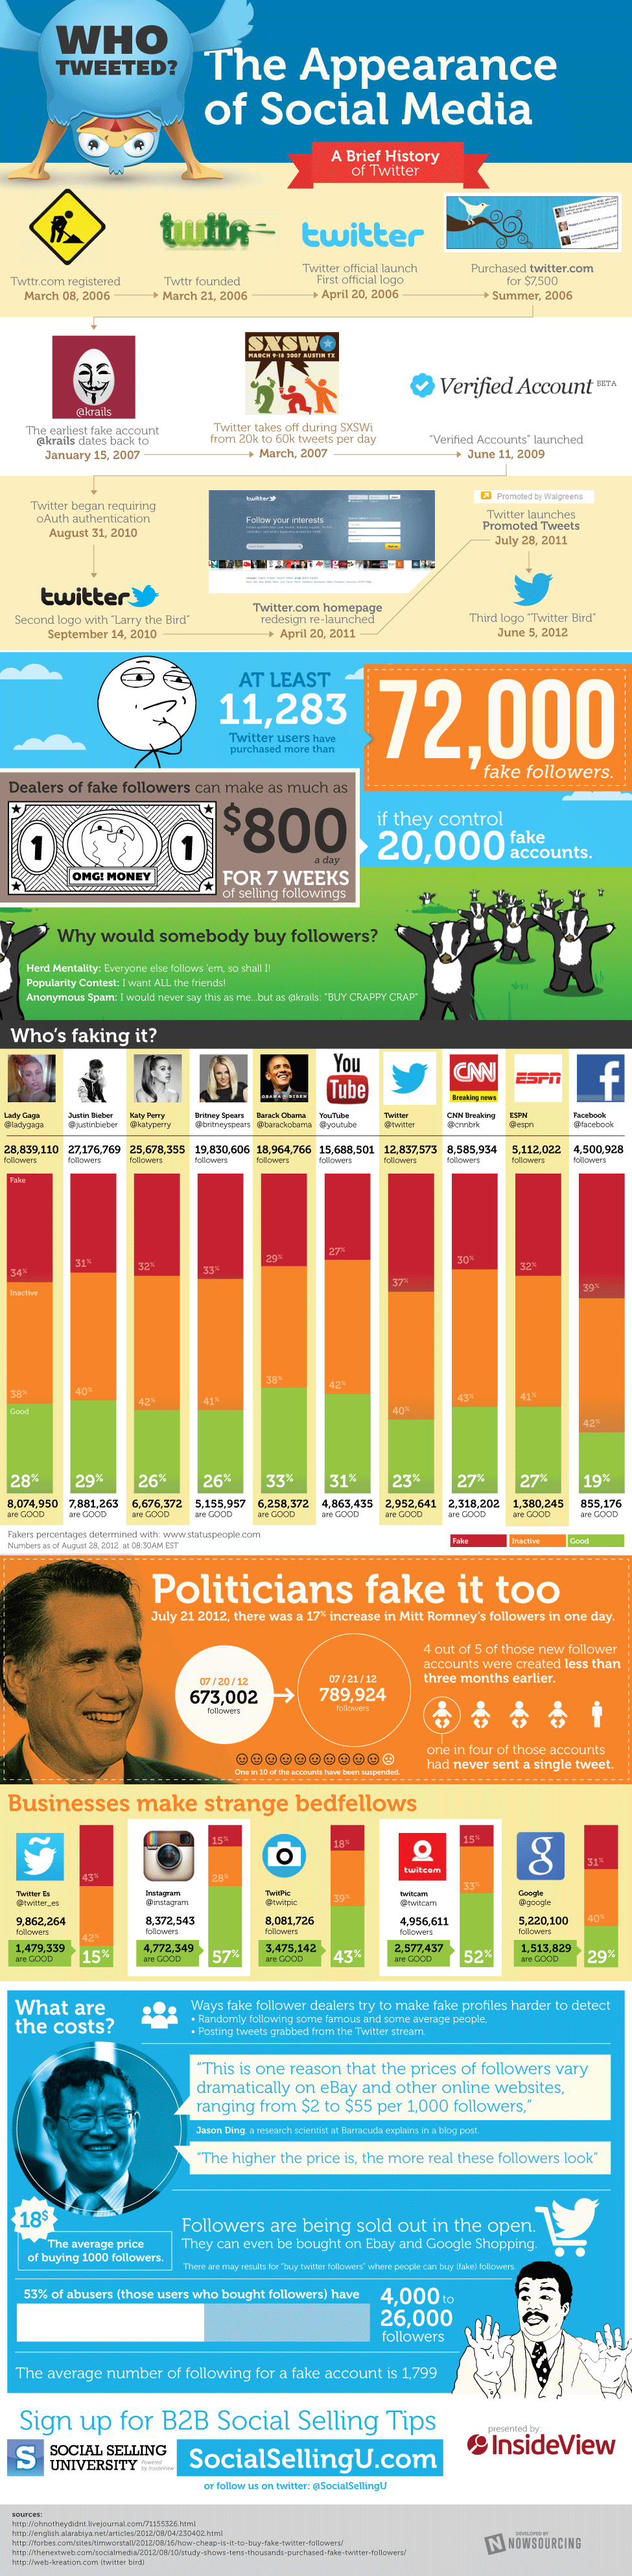 Fake Twitter Profiles